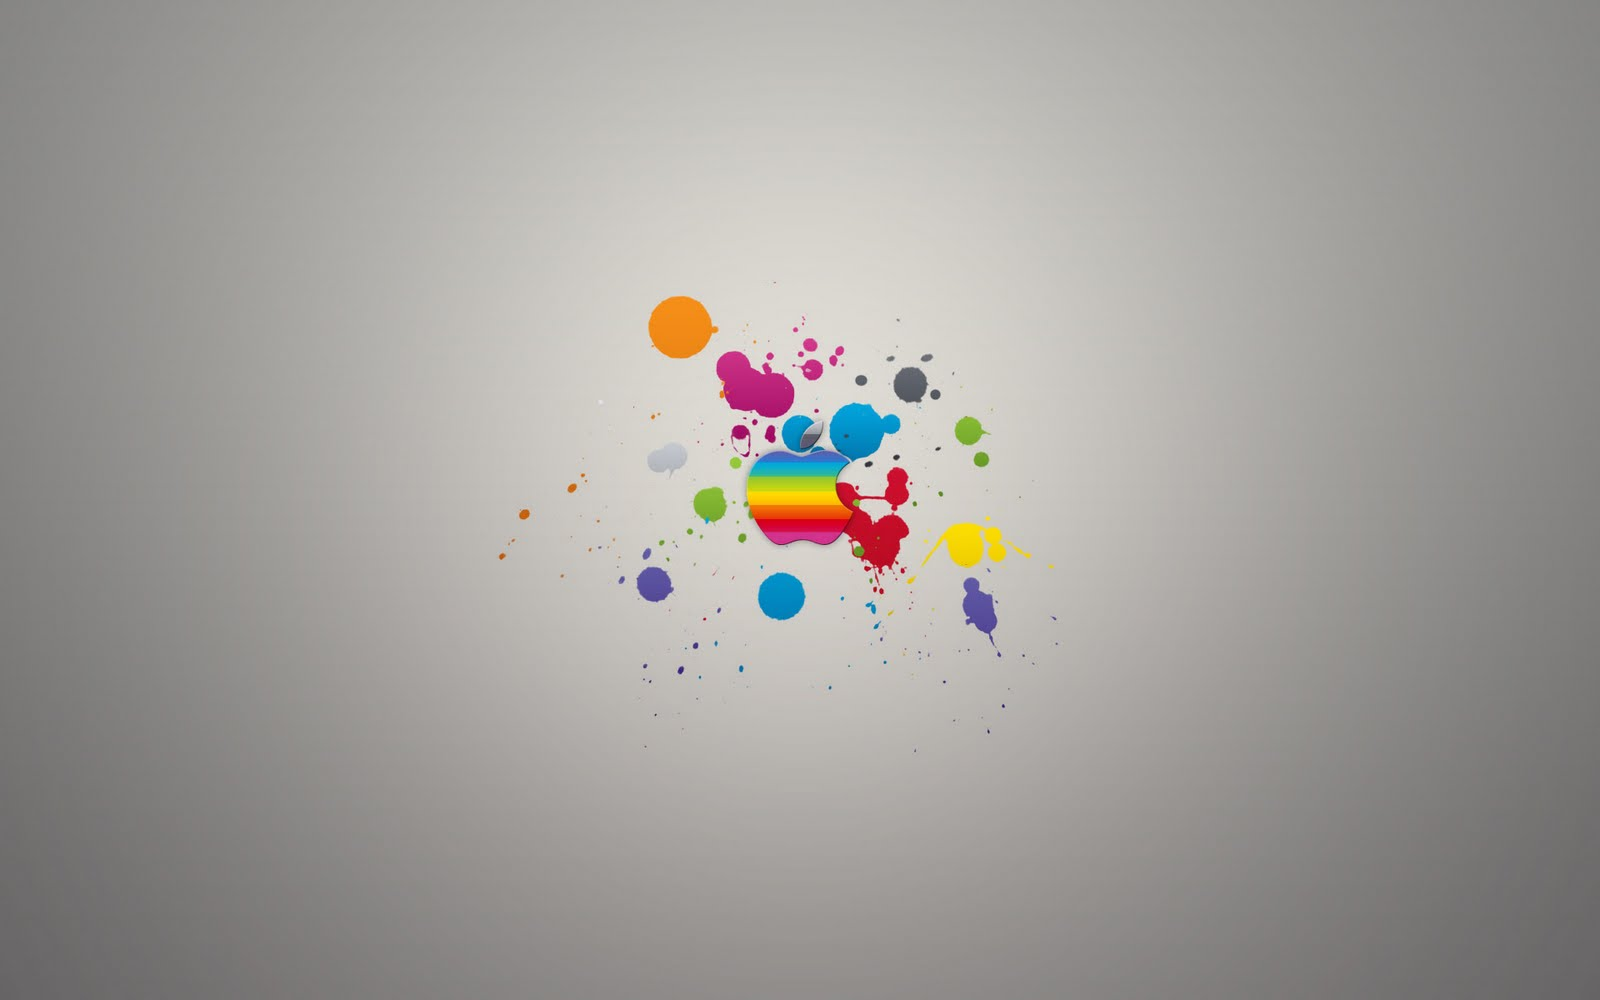 http://3.bp.blogspot.com/-HAAIk-IUWkw/UD3WFT8436I/AAAAAAAAASE/LKmMgKlLOyM/s1600/Apple%2BLOGO%2Bin%2BMac%2BOS%2BX%2BLion%2Bwallpaper.jpg